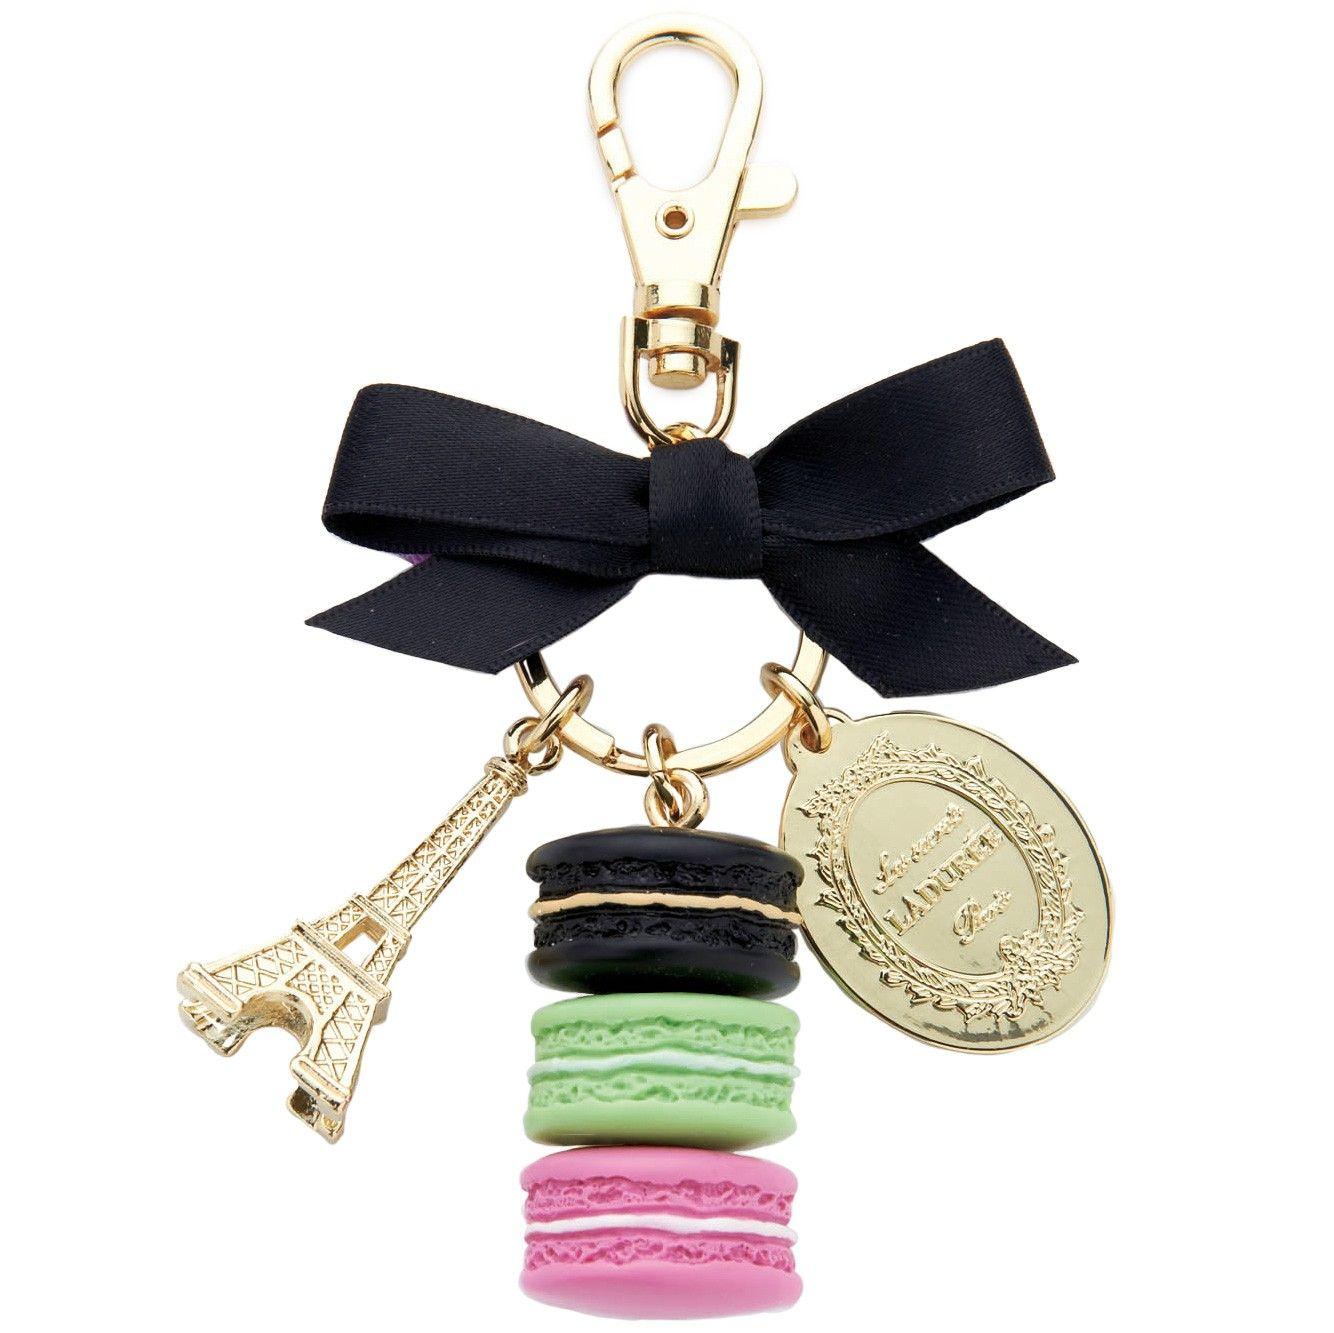 key ring m reglisse ladur e ladur e rings accessories und macarons. Black Bedroom Furniture Sets. Home Design Ideas